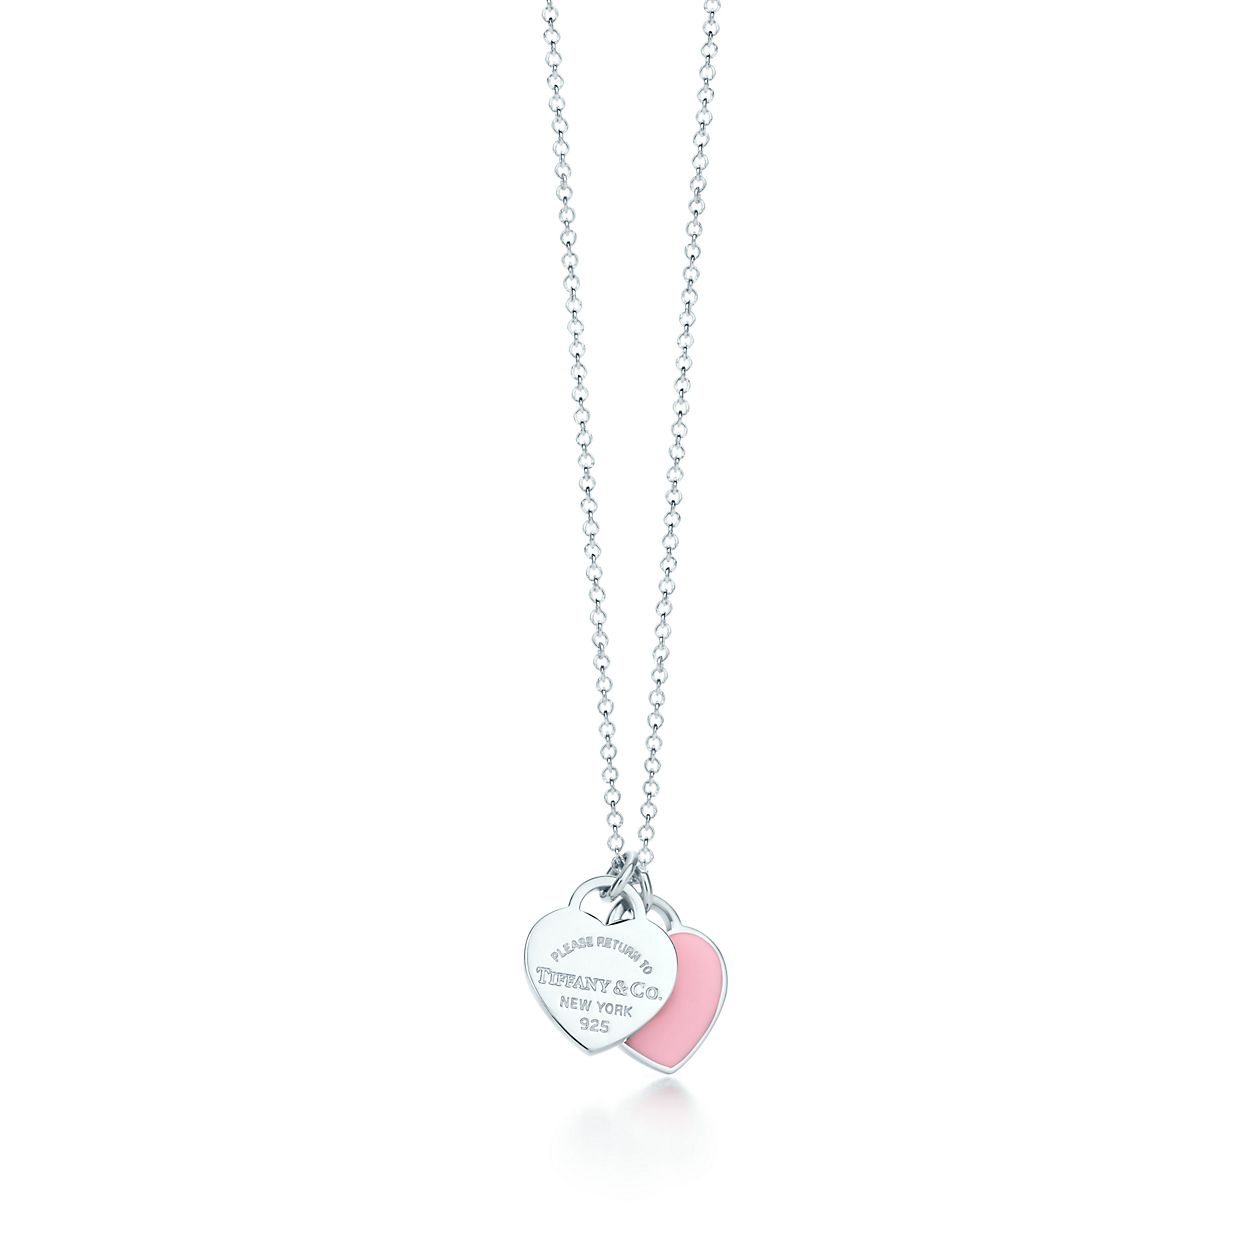 Tiffany Infinity pendant in sterling silver with Tiffany Blue enamel finish Tiffany & Co. FJ4fwJKW